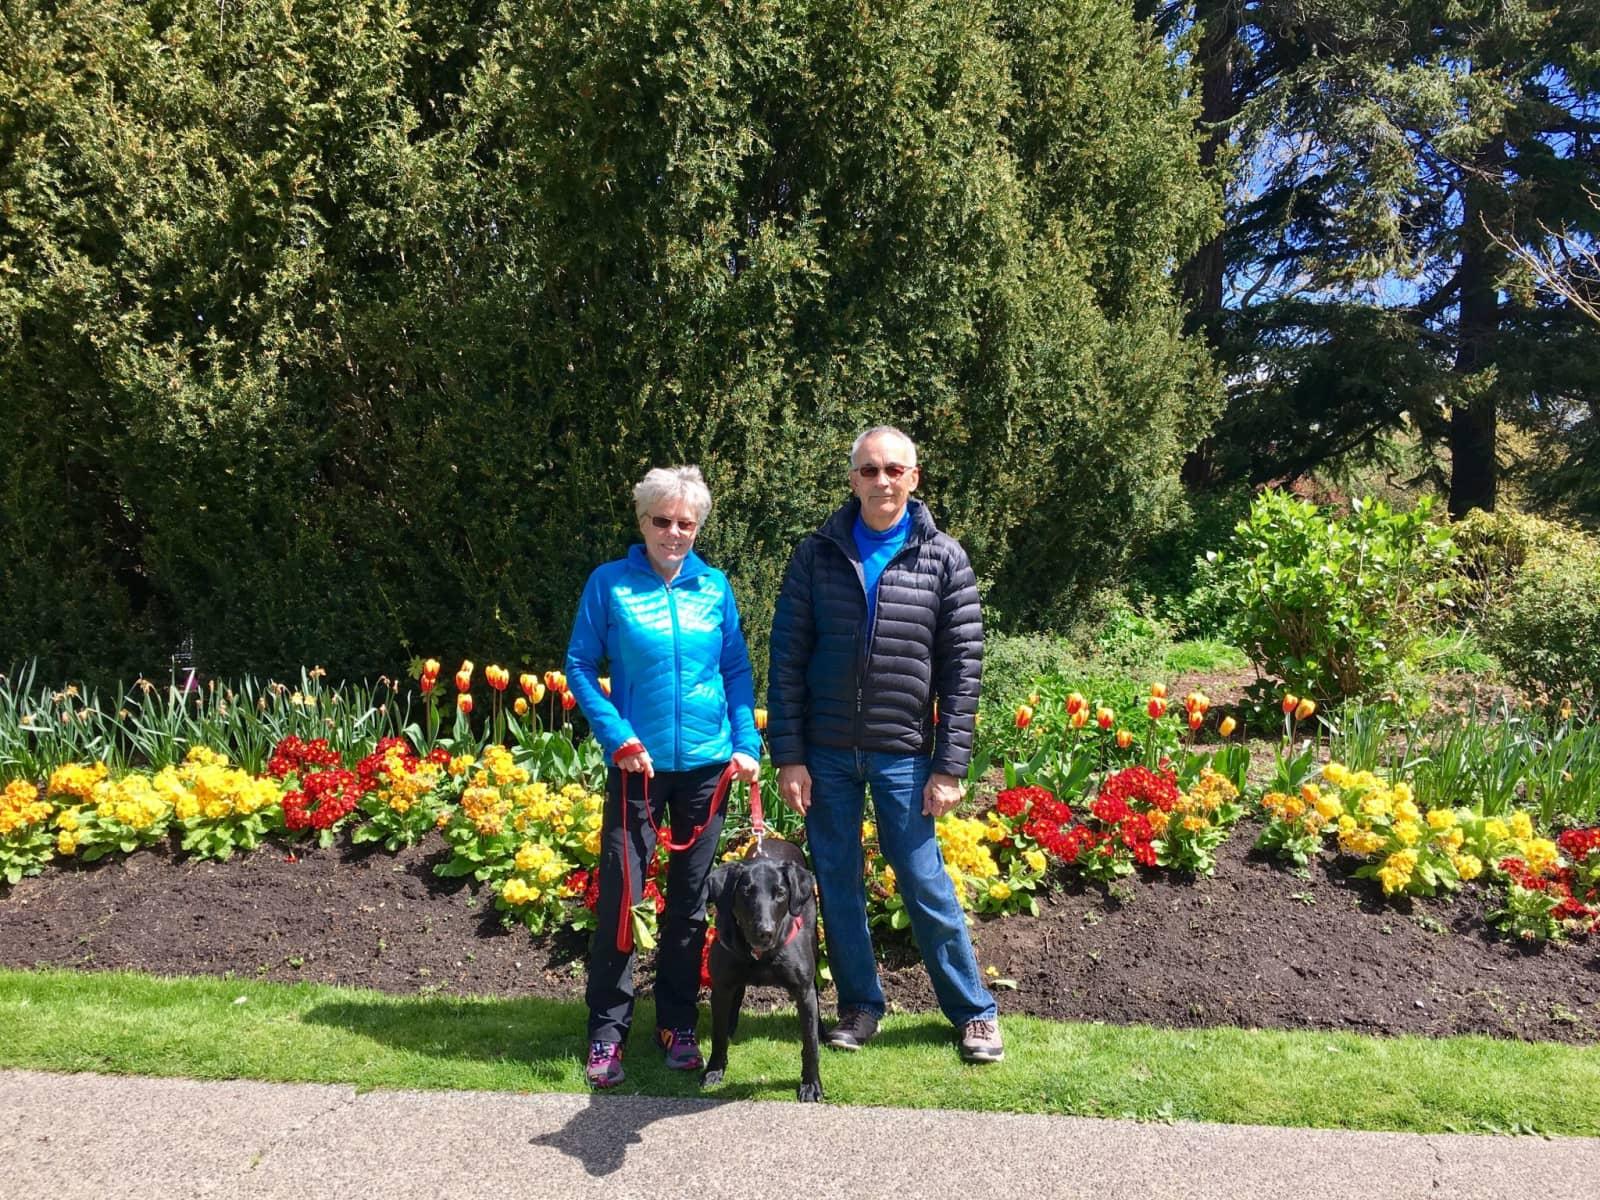 Jane & James from Courtenay, British Columbia, Canada